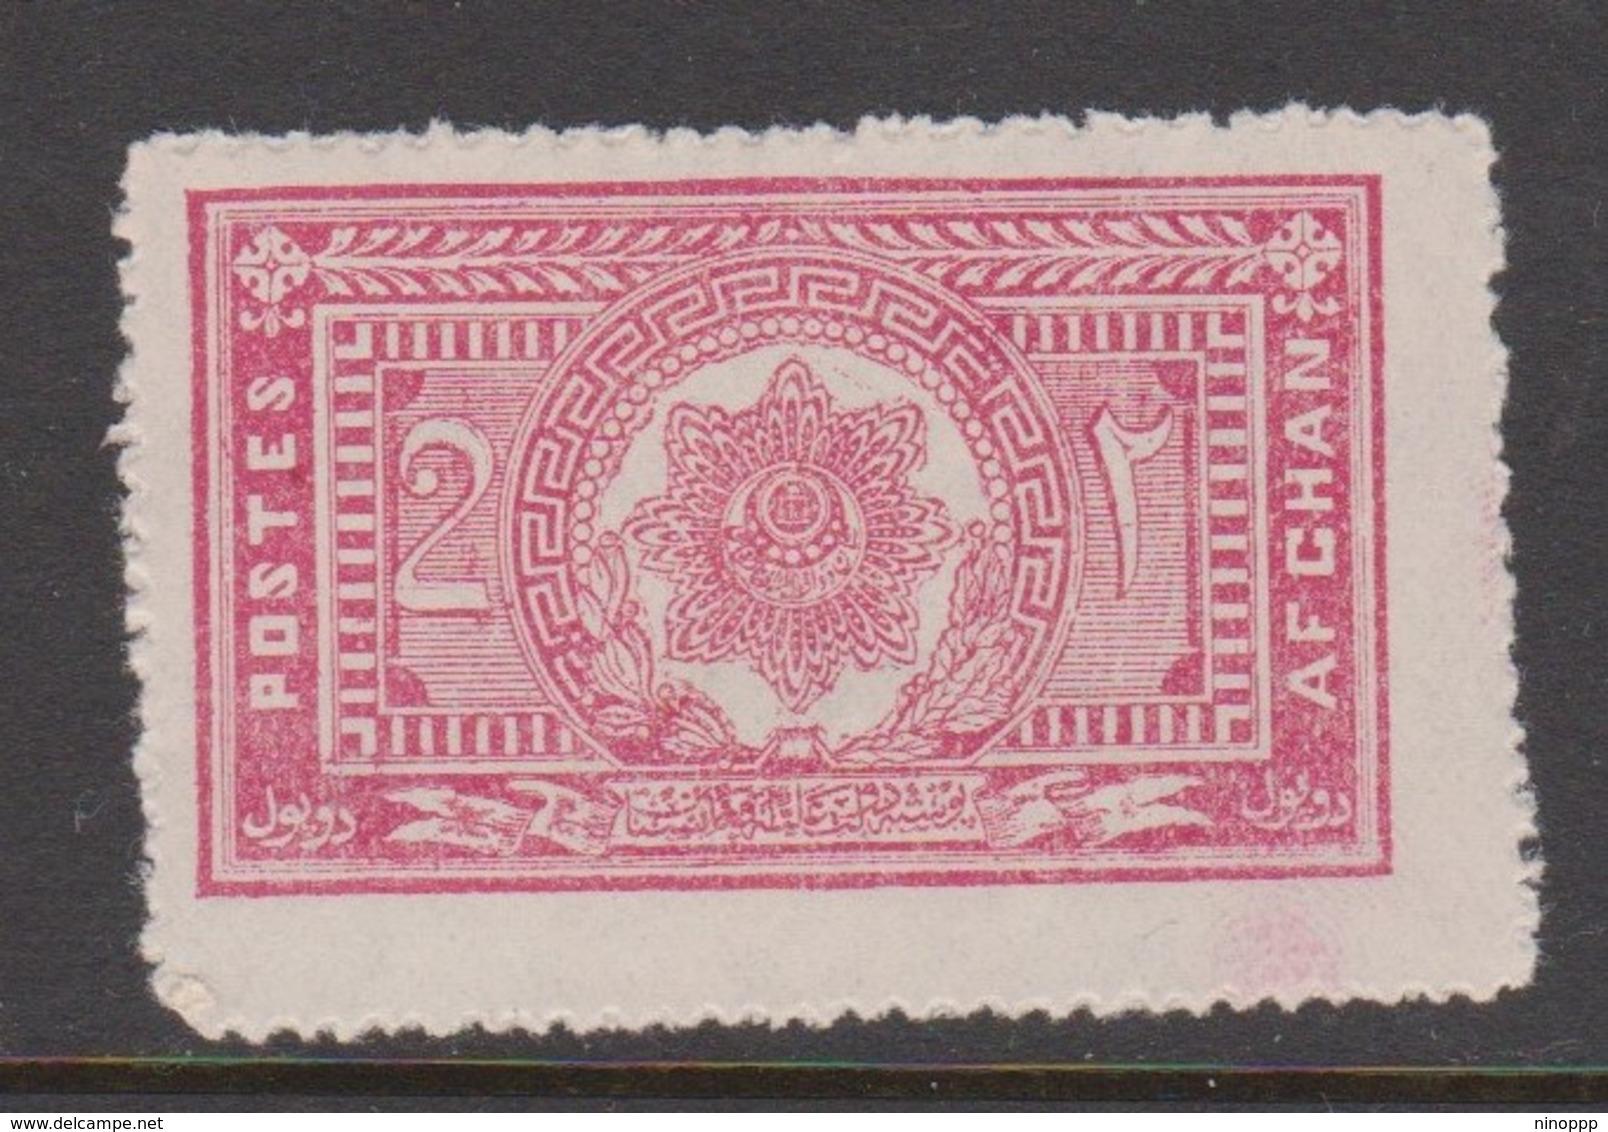 Afghanistan Scott 238 1930 2p Rose MNH - Afghanistan